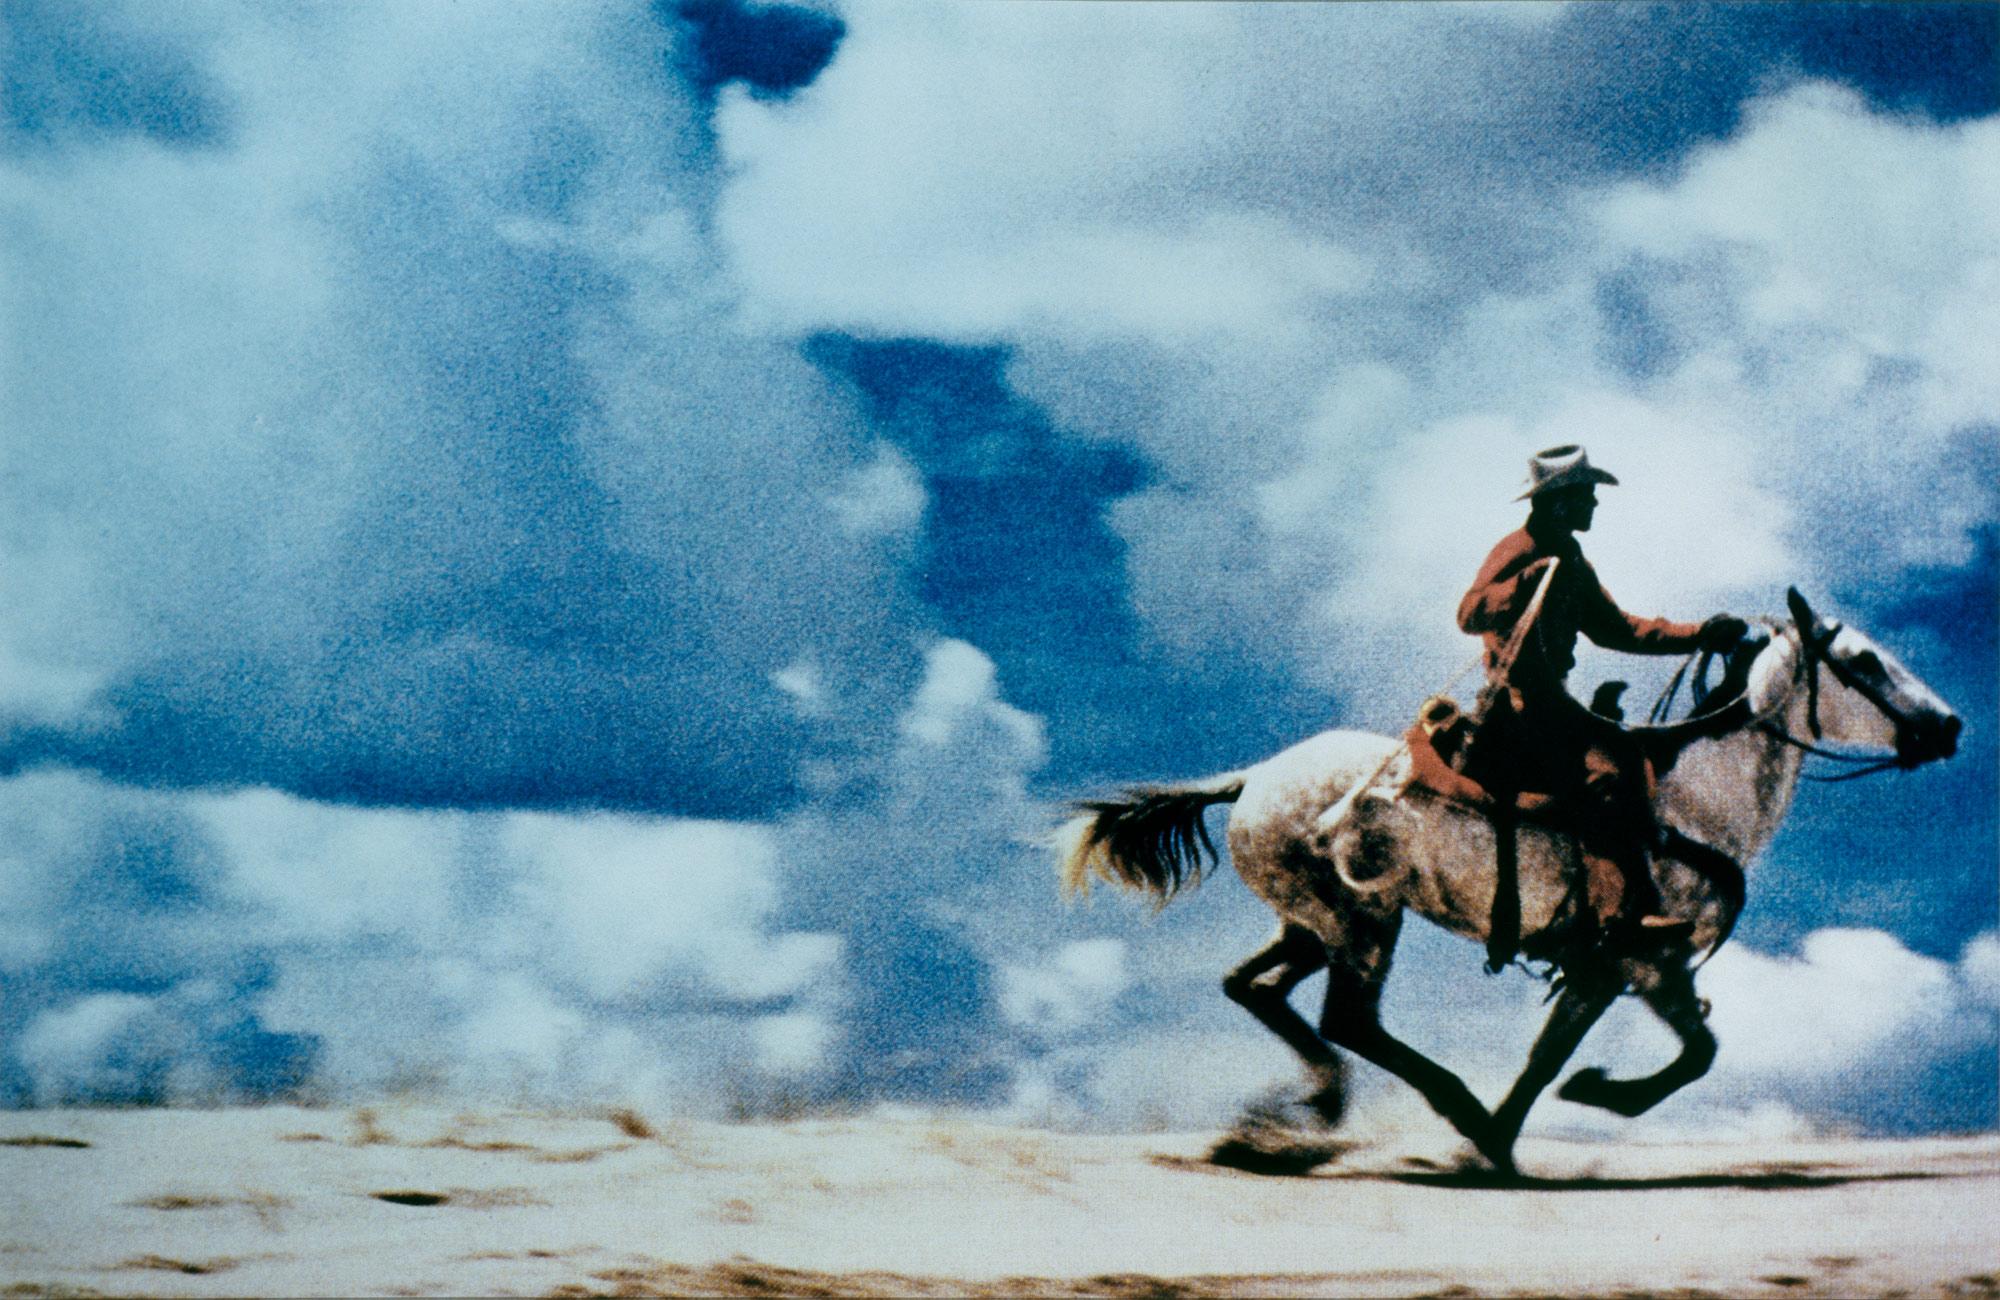 Untitled (Cowboy), 1989 - Richard Prince (American, born 1949)